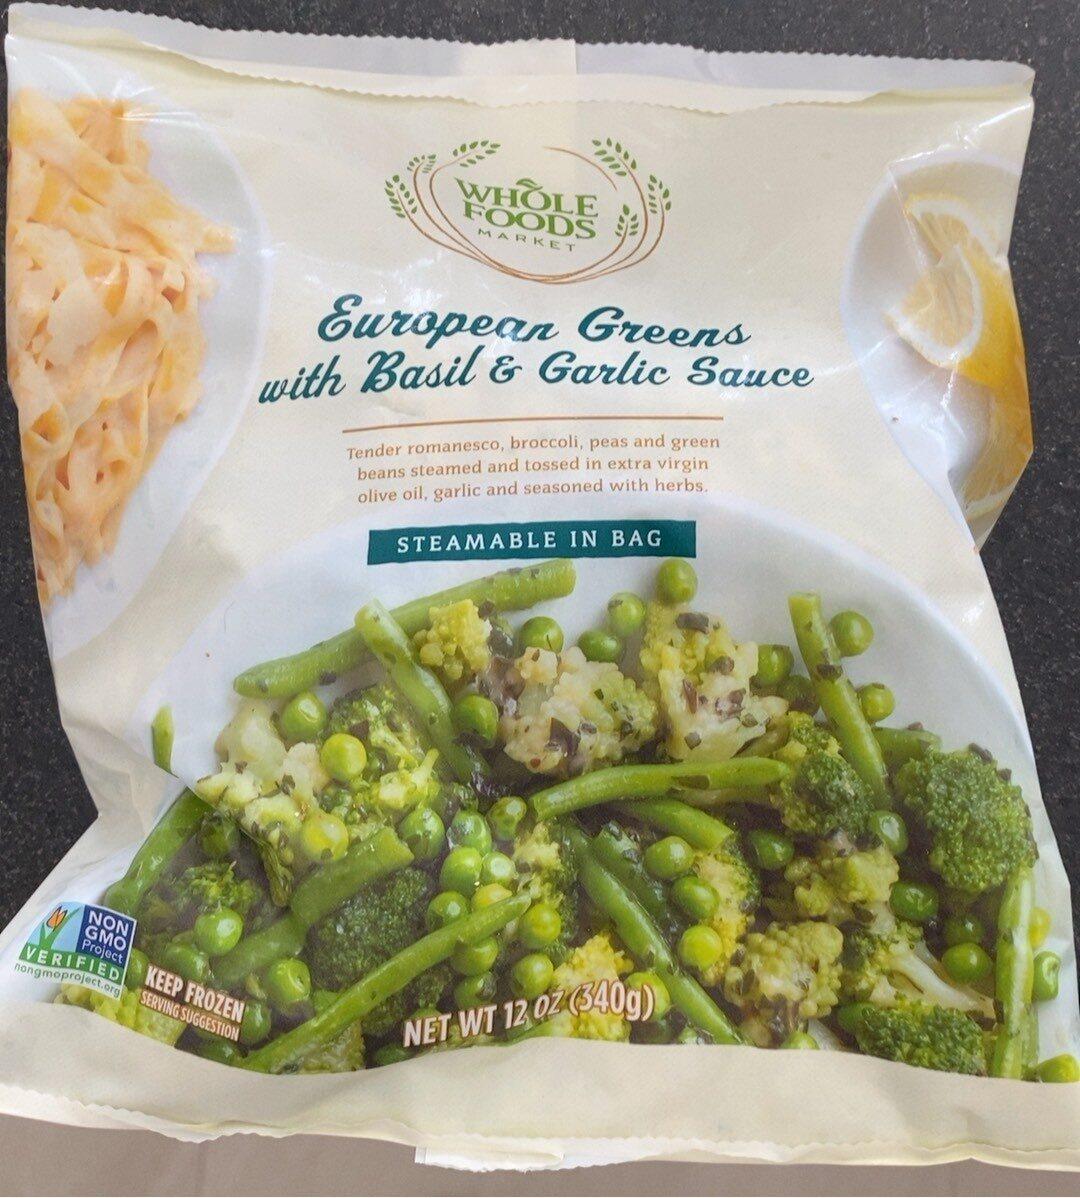 European greens with basil & garlic sauce - Product - en